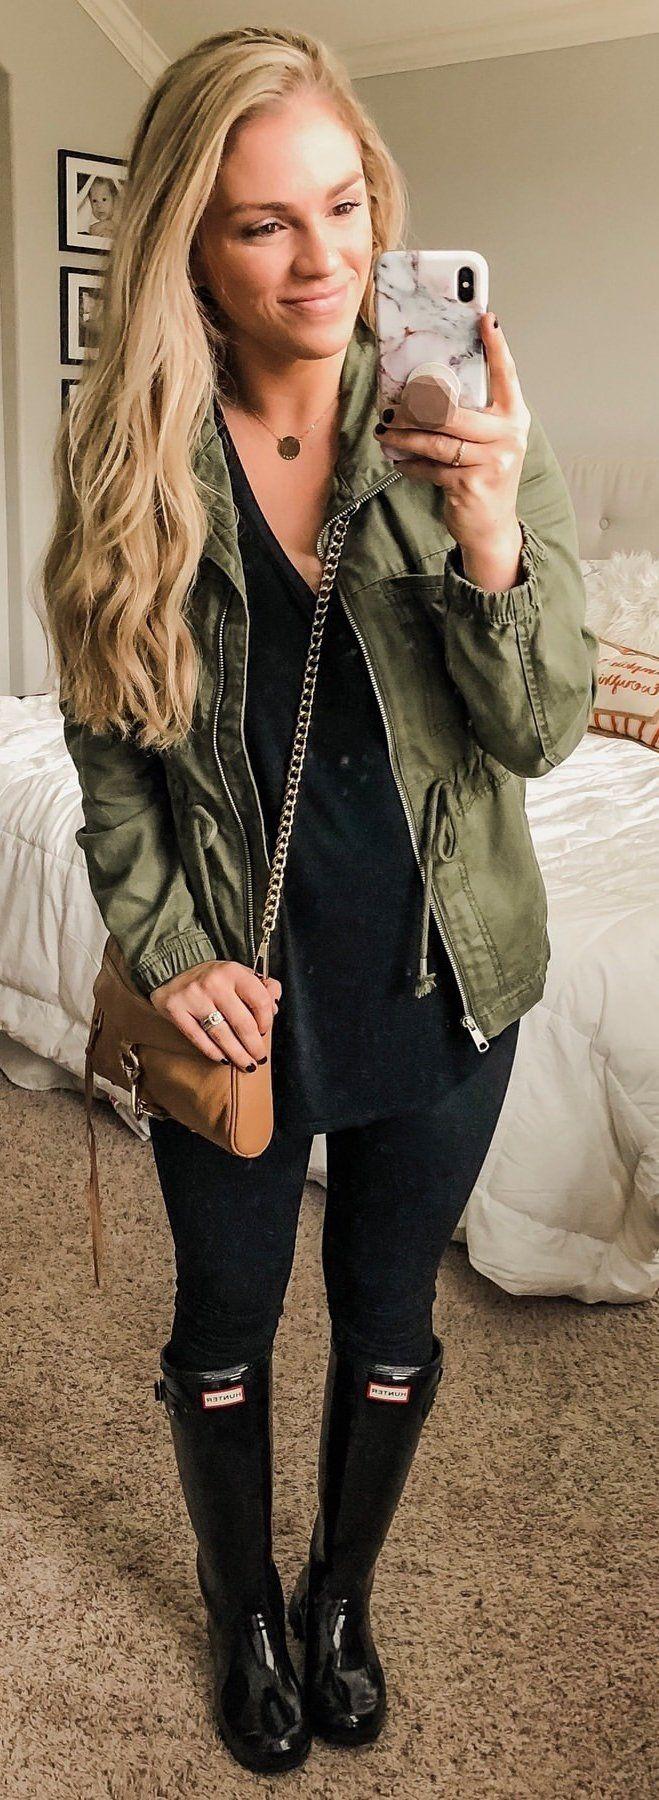 black plunging neckline shirt and green zip-up jacket